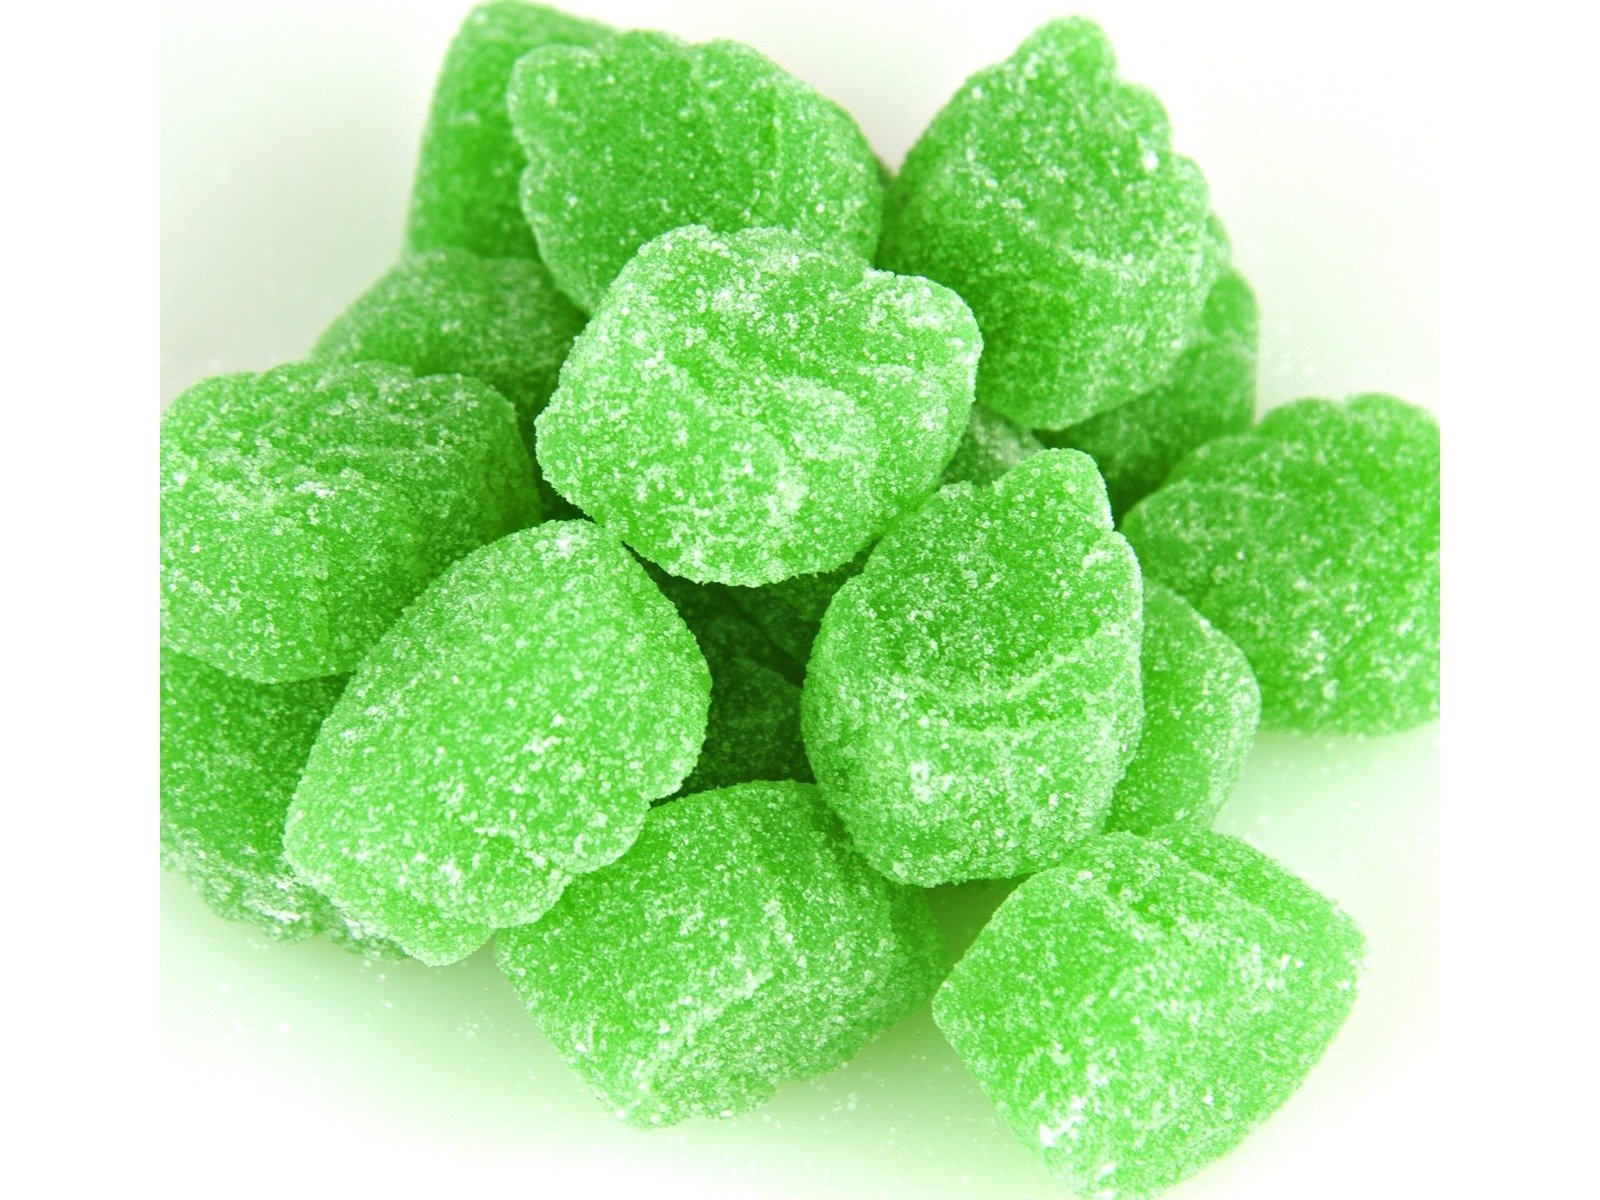 Ferrara Spearmint Leaves Candy jelly spearmint slices (1Lb)